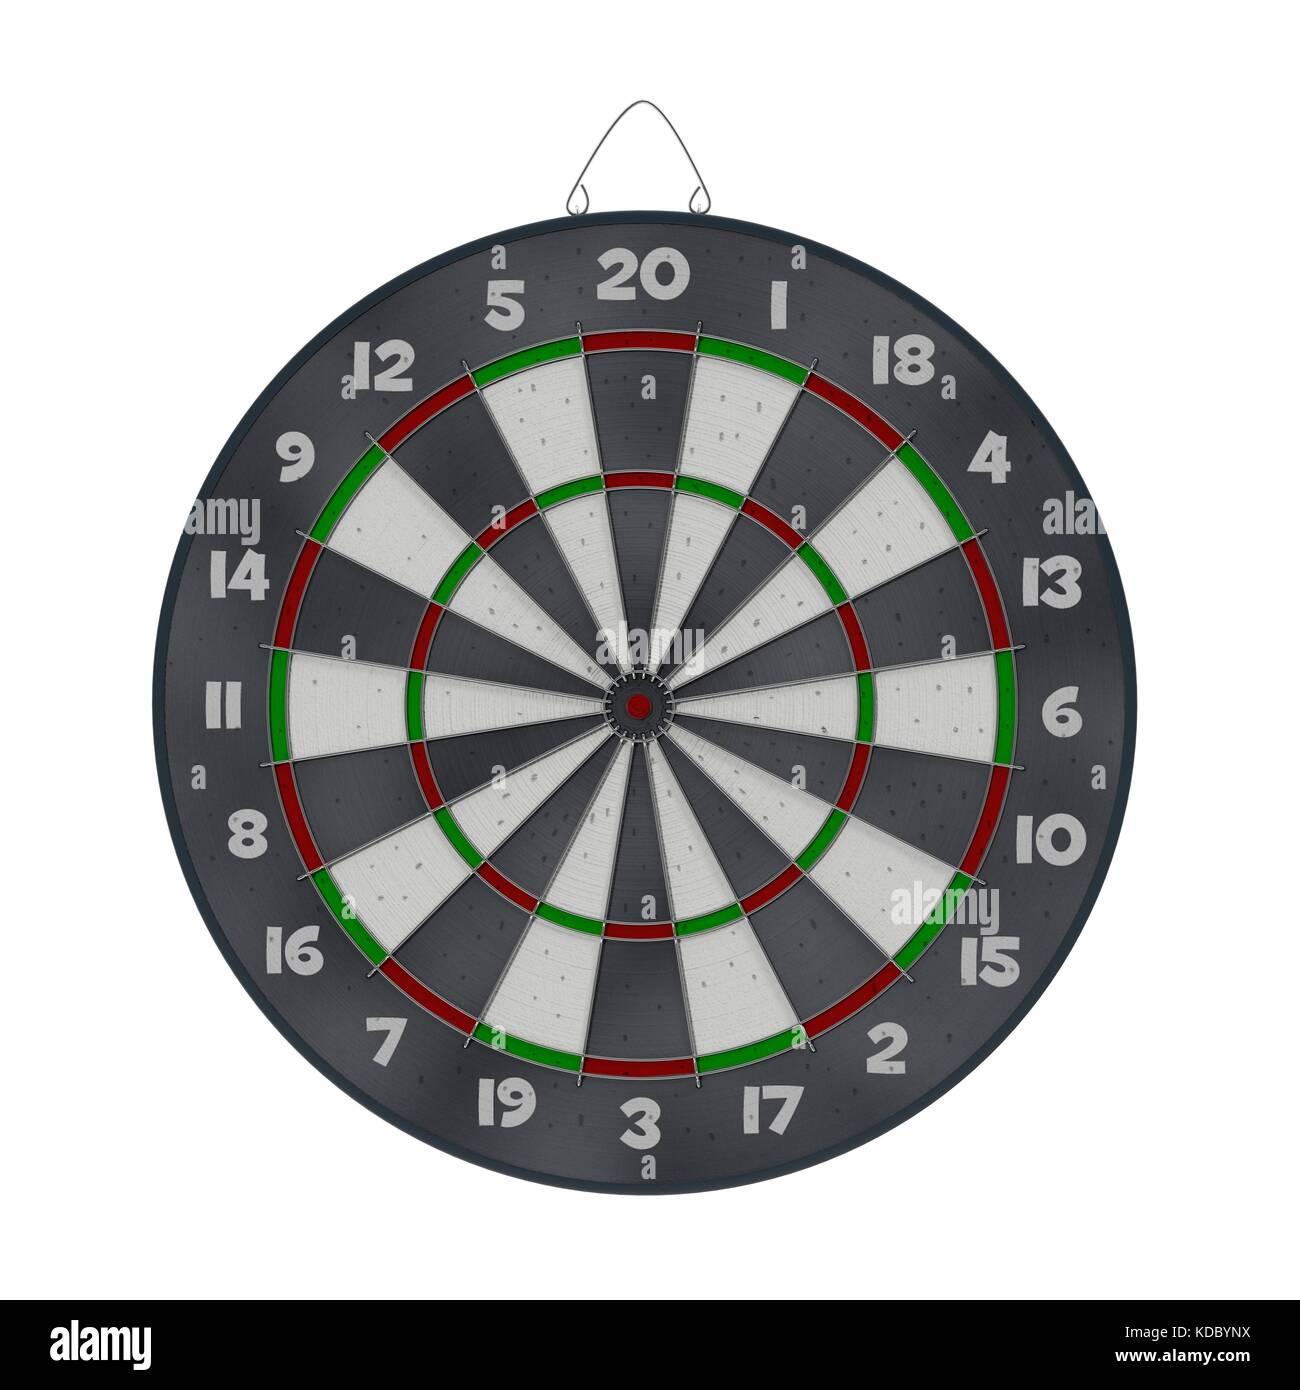 Old target dartboard isolate on white. - Stock Image